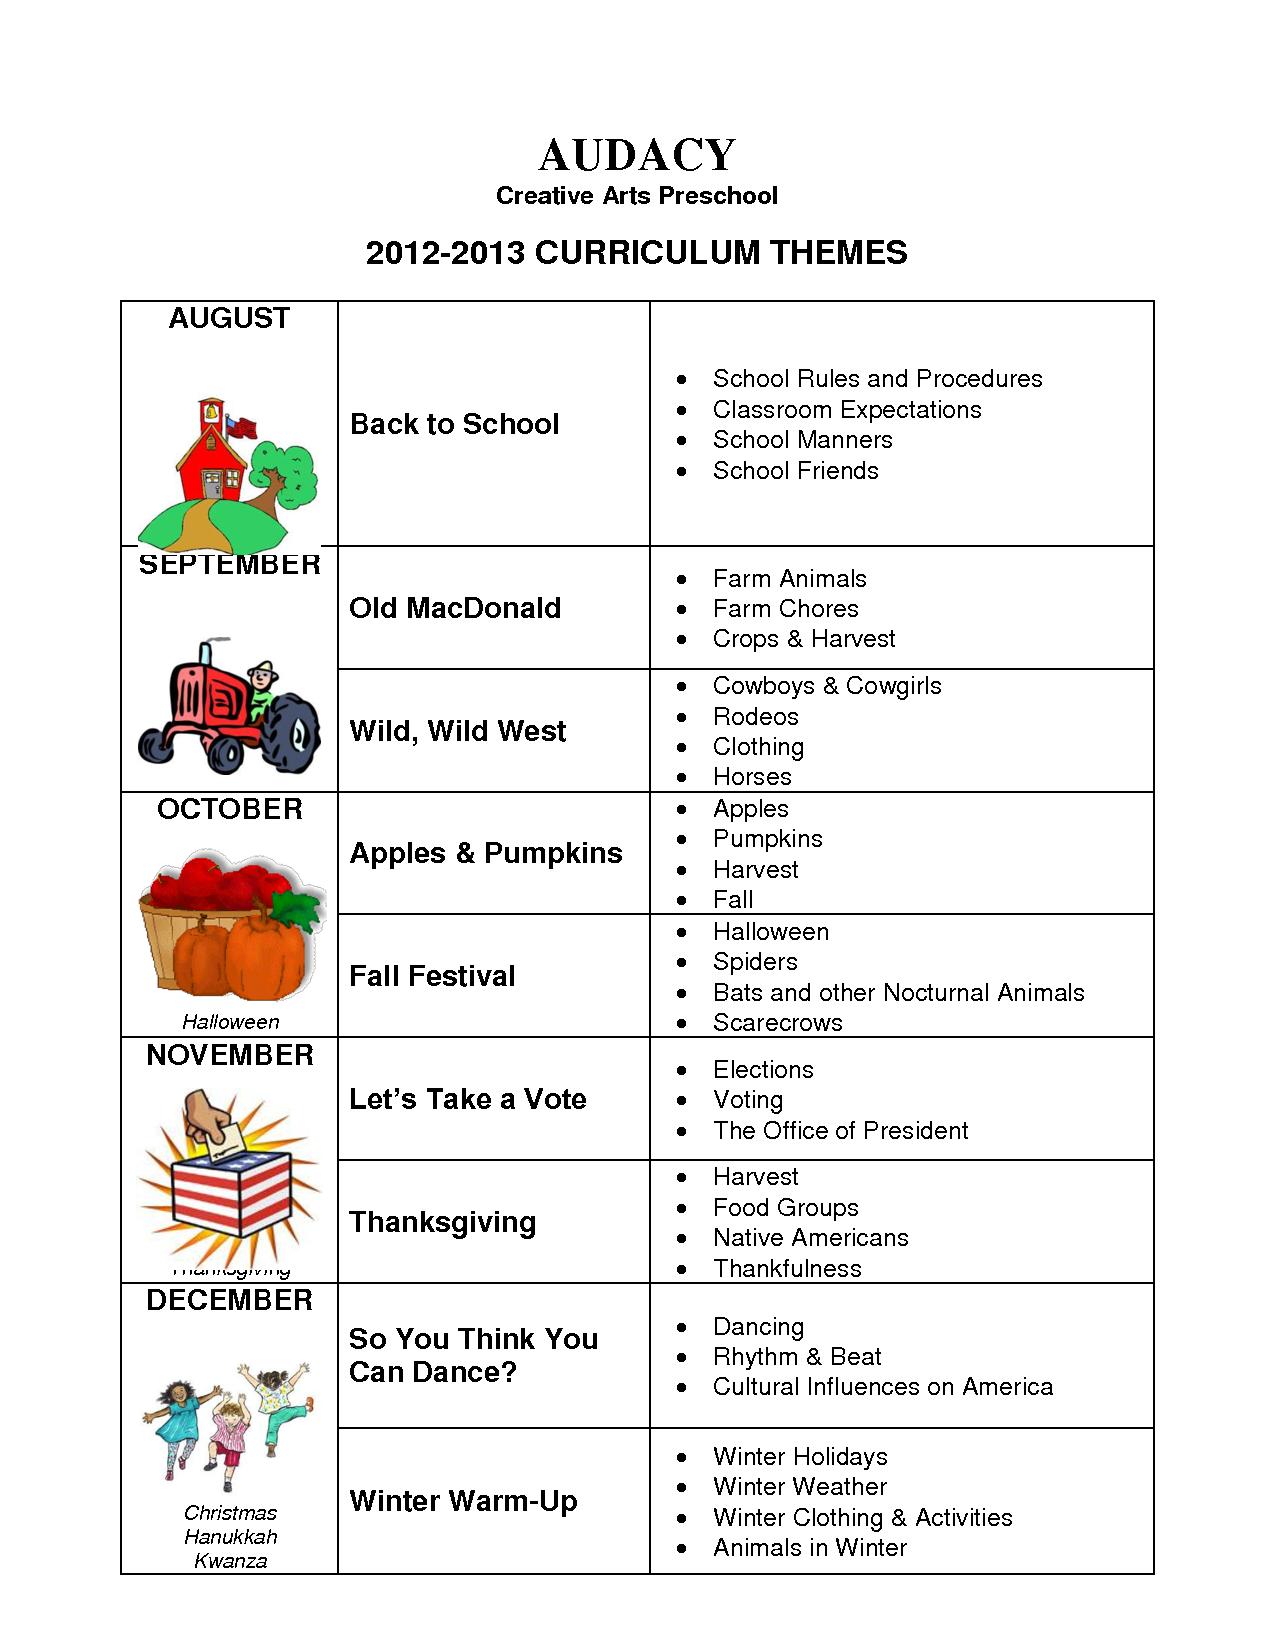 Monthly Calendar For Kindergarten : Preschool monthly theme ideas google search calendar